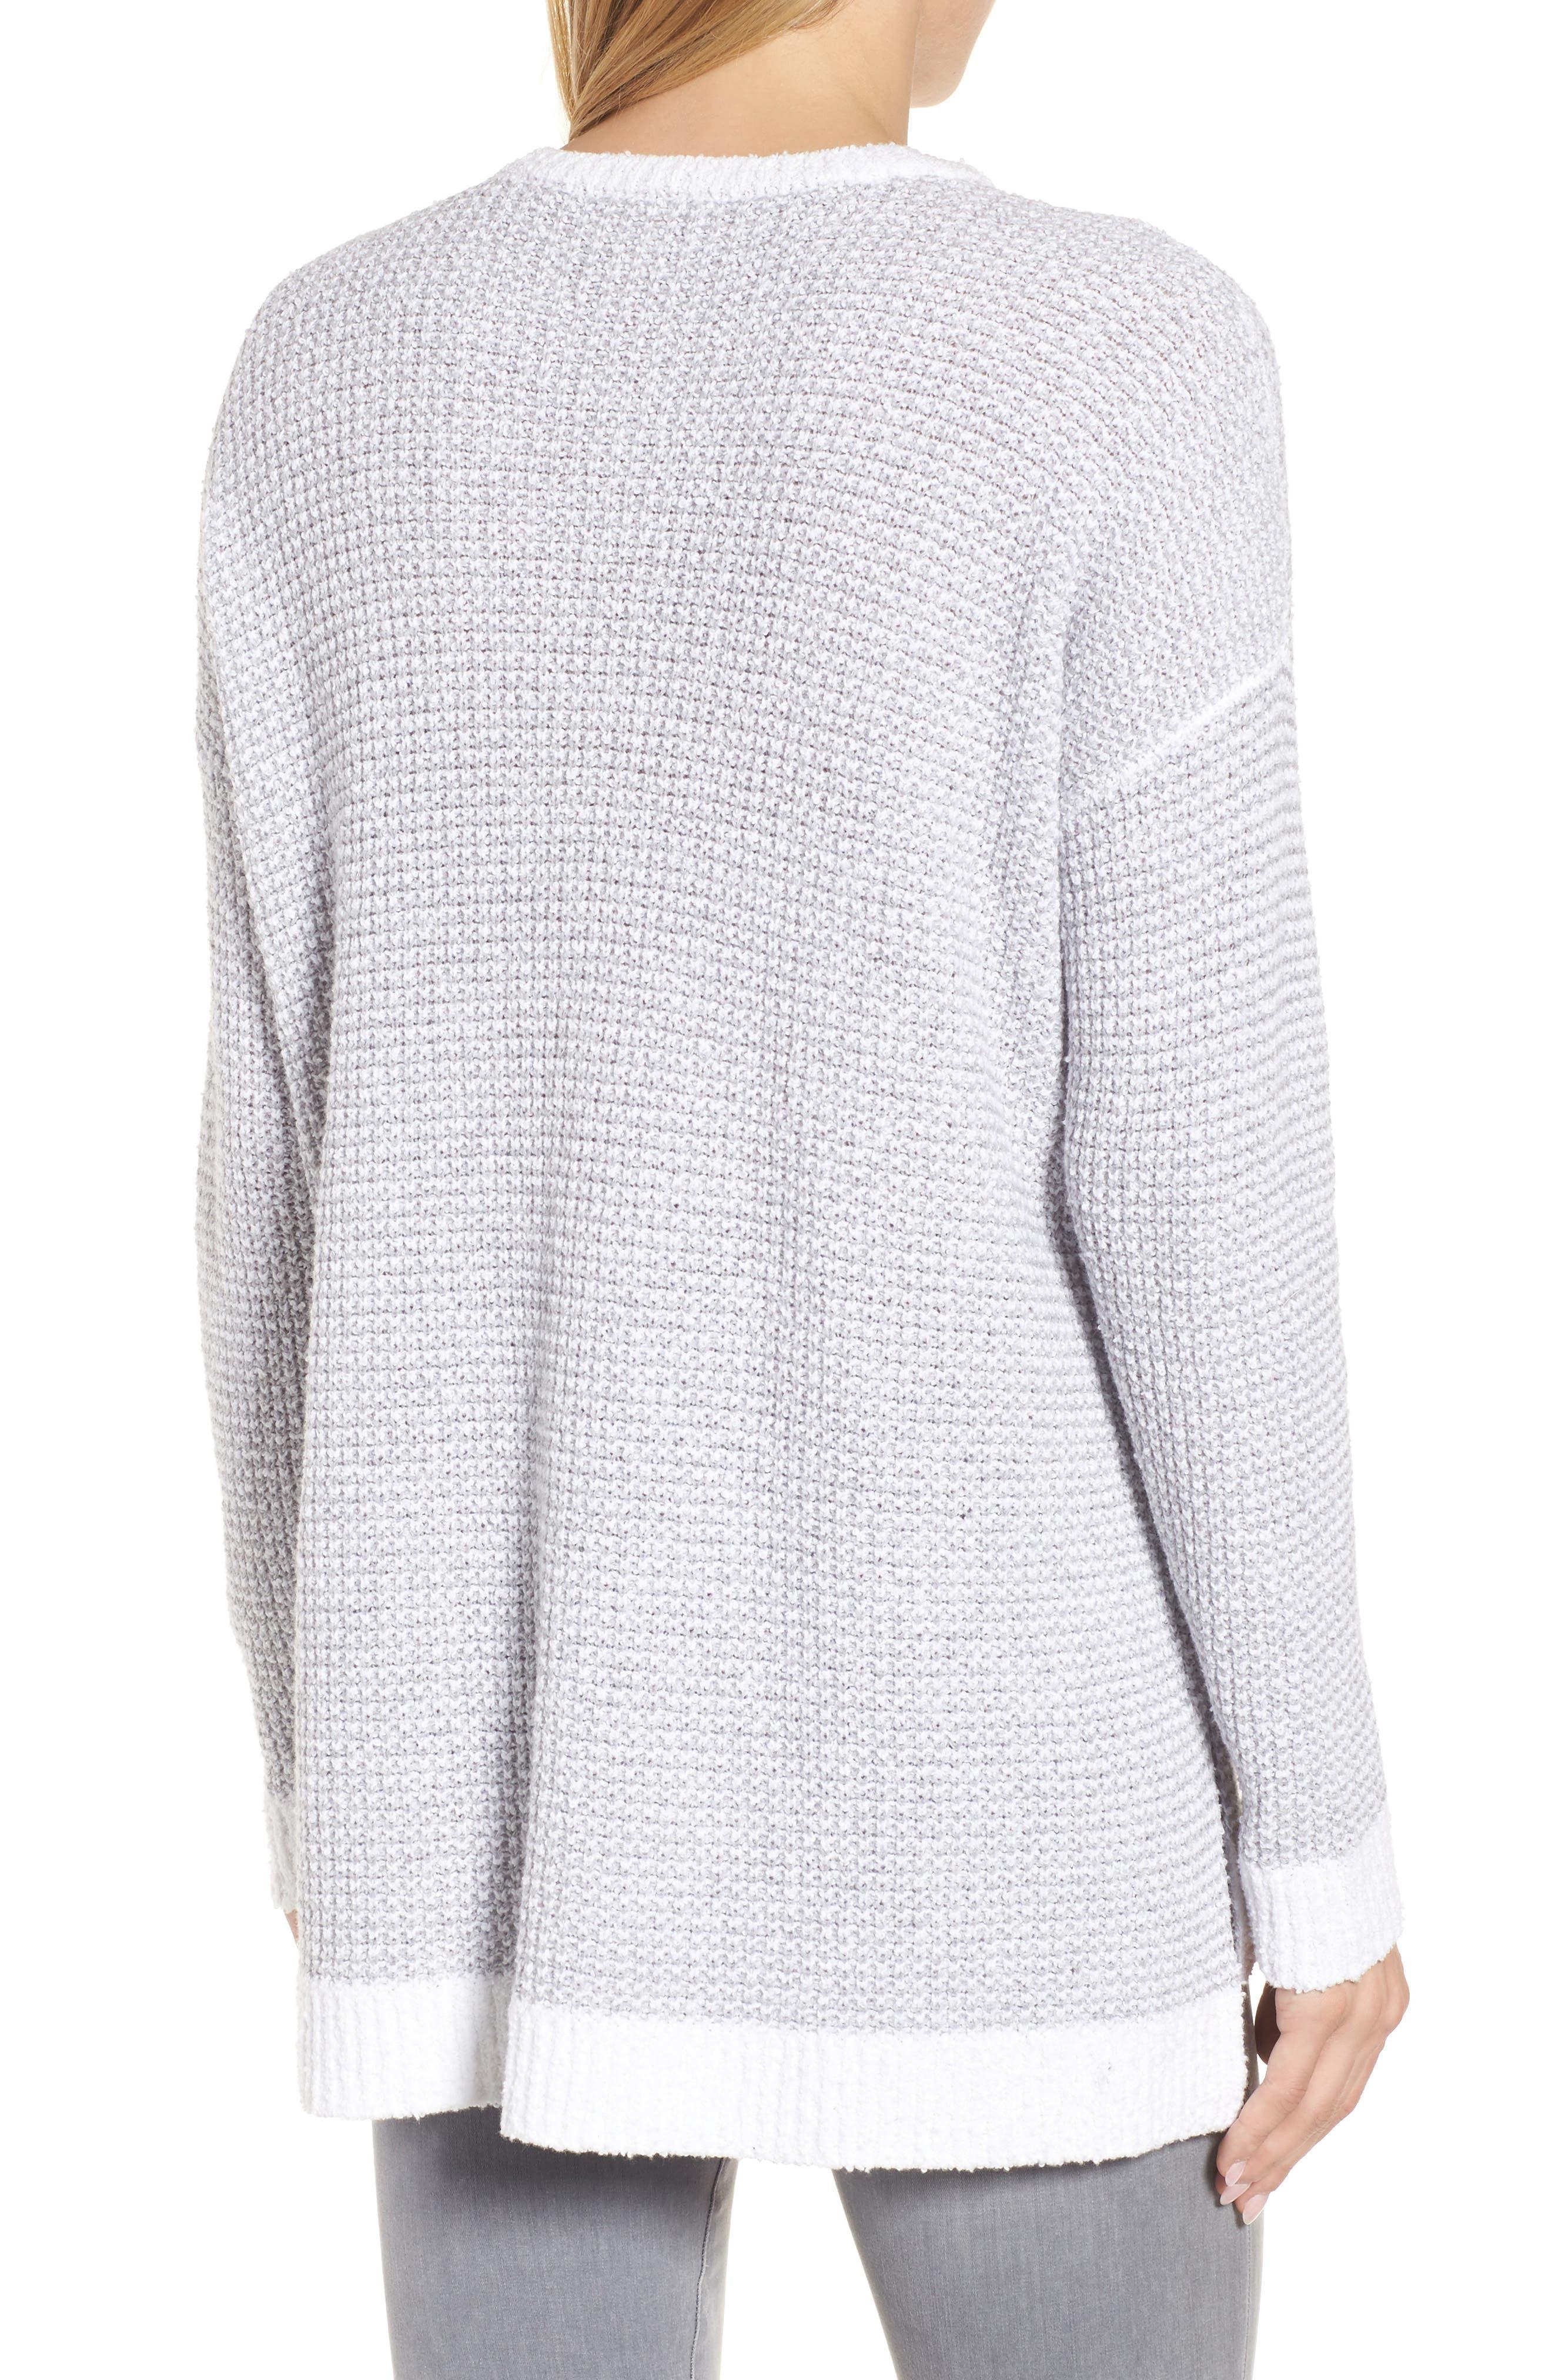 Waffled Organic Cotton Sweater,                             Alternate thumbnail 2, color,                             Dark Pearl